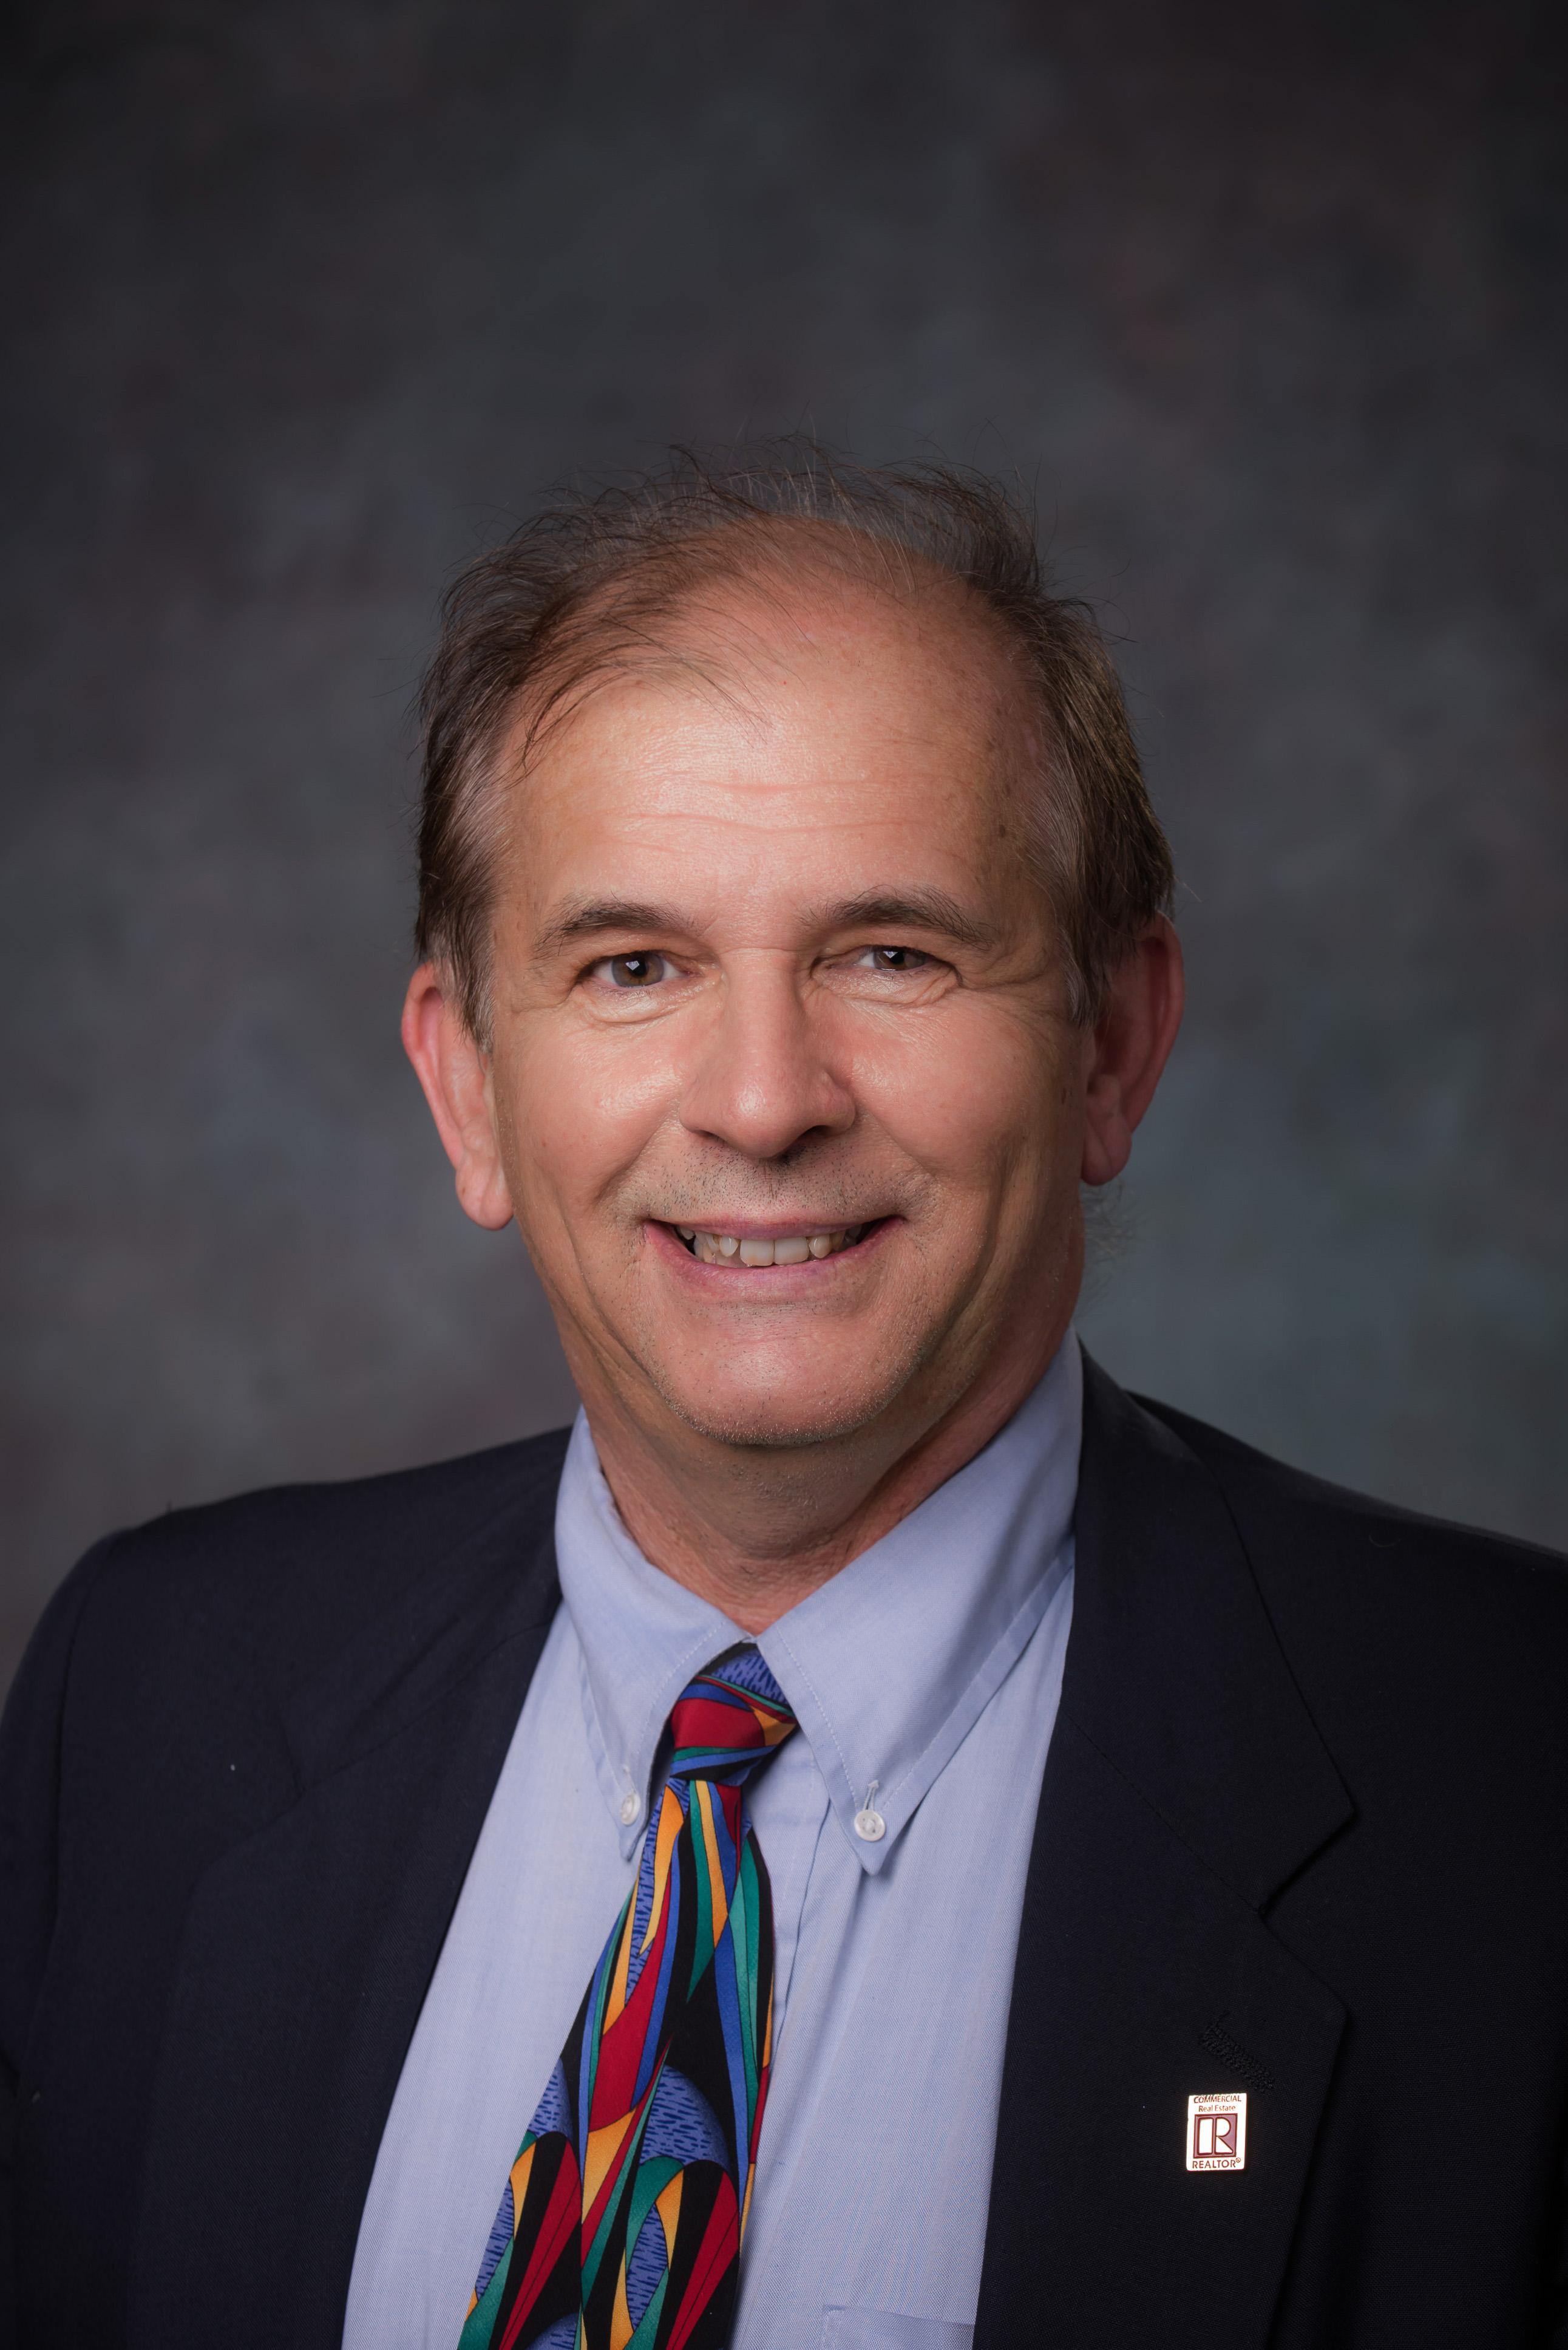 Dean Burnette, Best Business Brokers